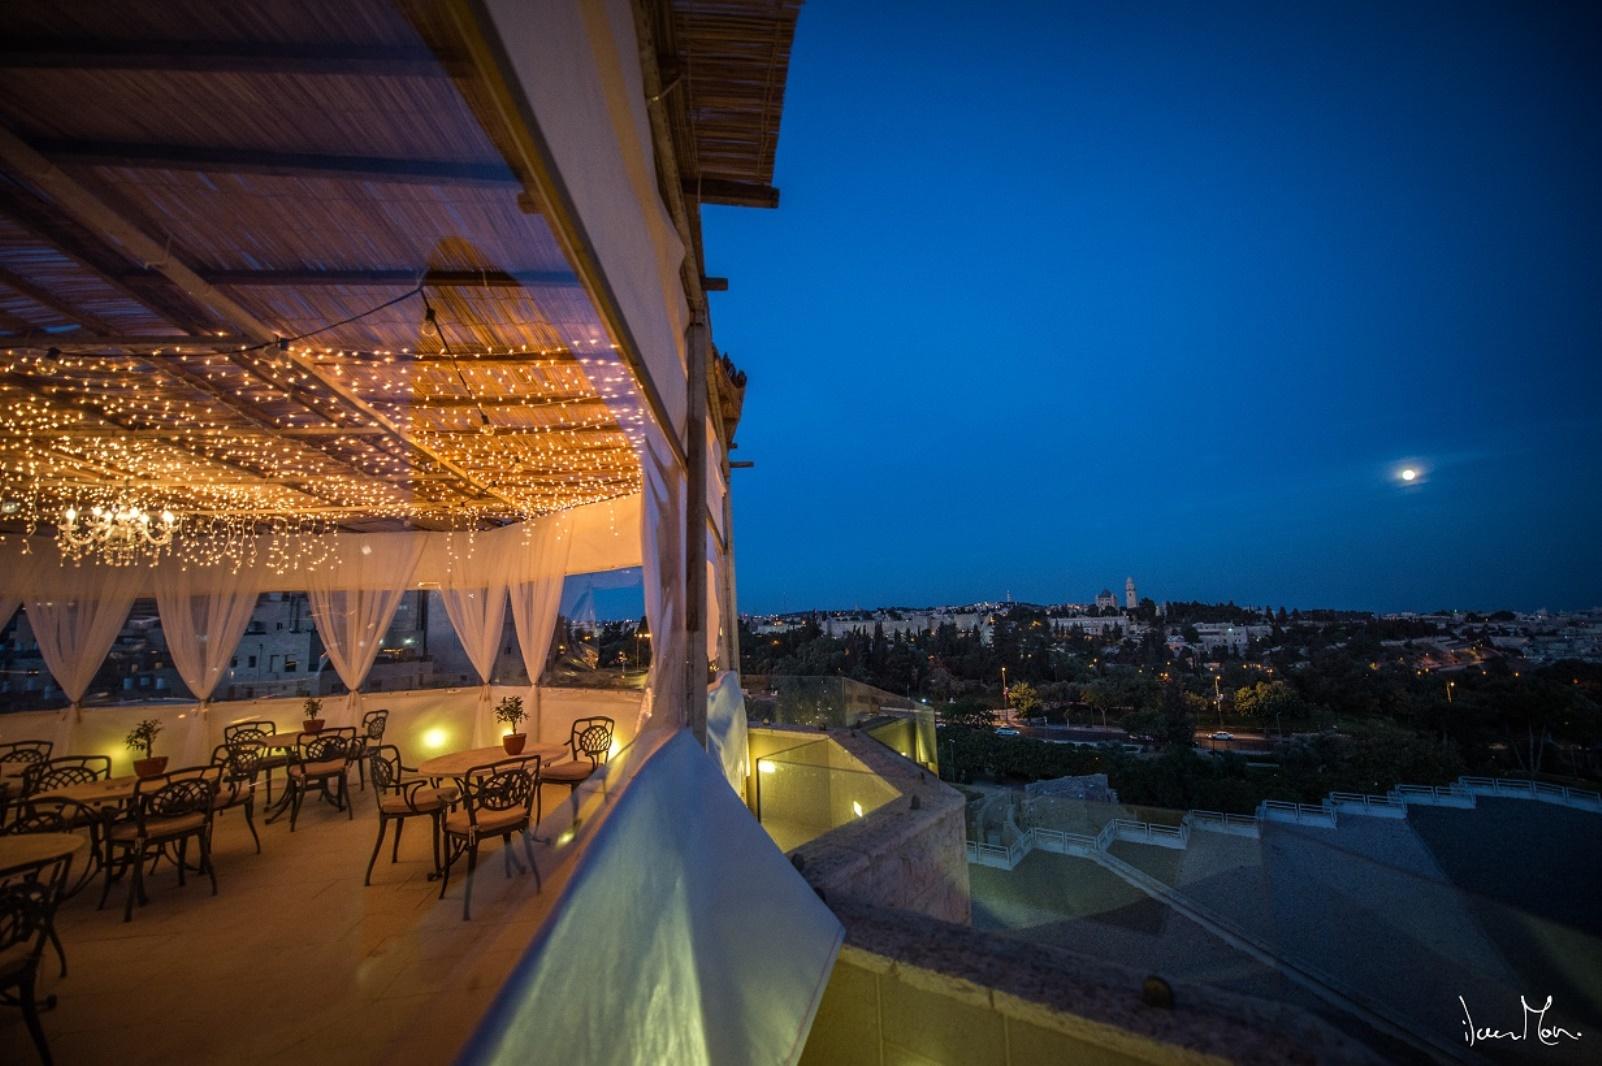 9 of the most beautiful sukkot in Israel | ISRAEL21c